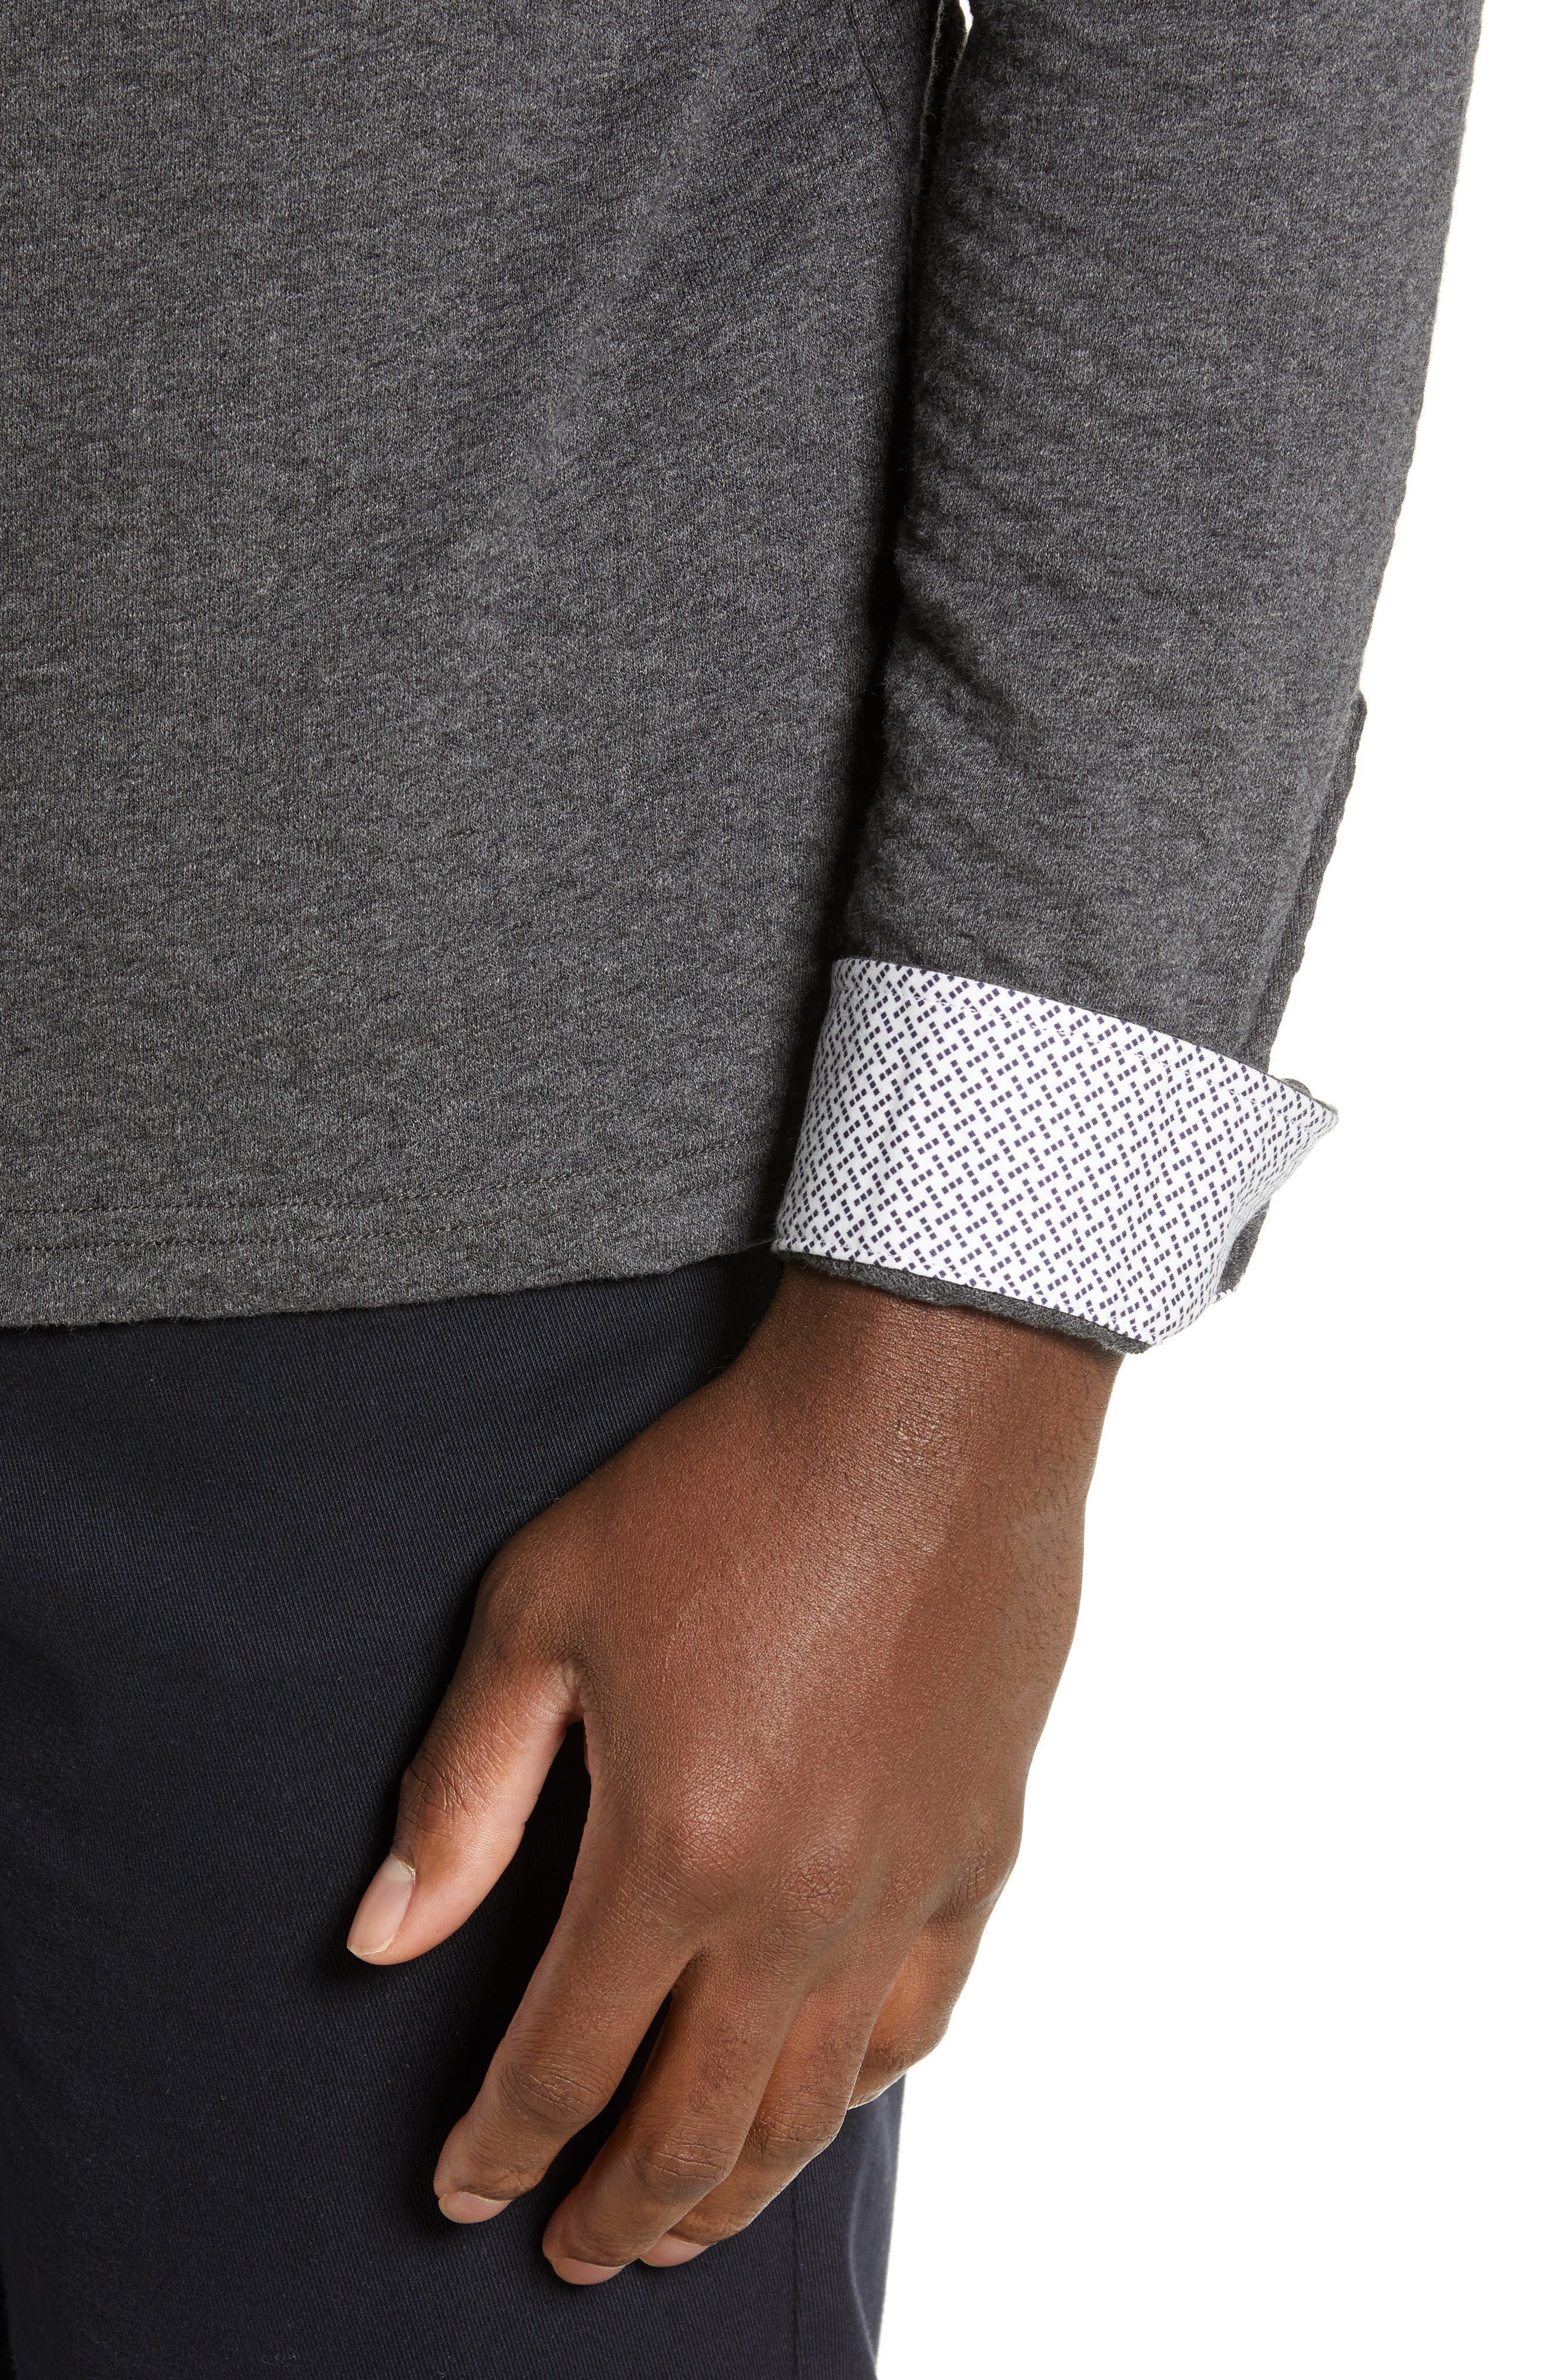 TED BAKER LONDON, Fruitpa Slim Fit Long Sleeve Polo, Alternate thumbnail 4, color, CHARCOAL